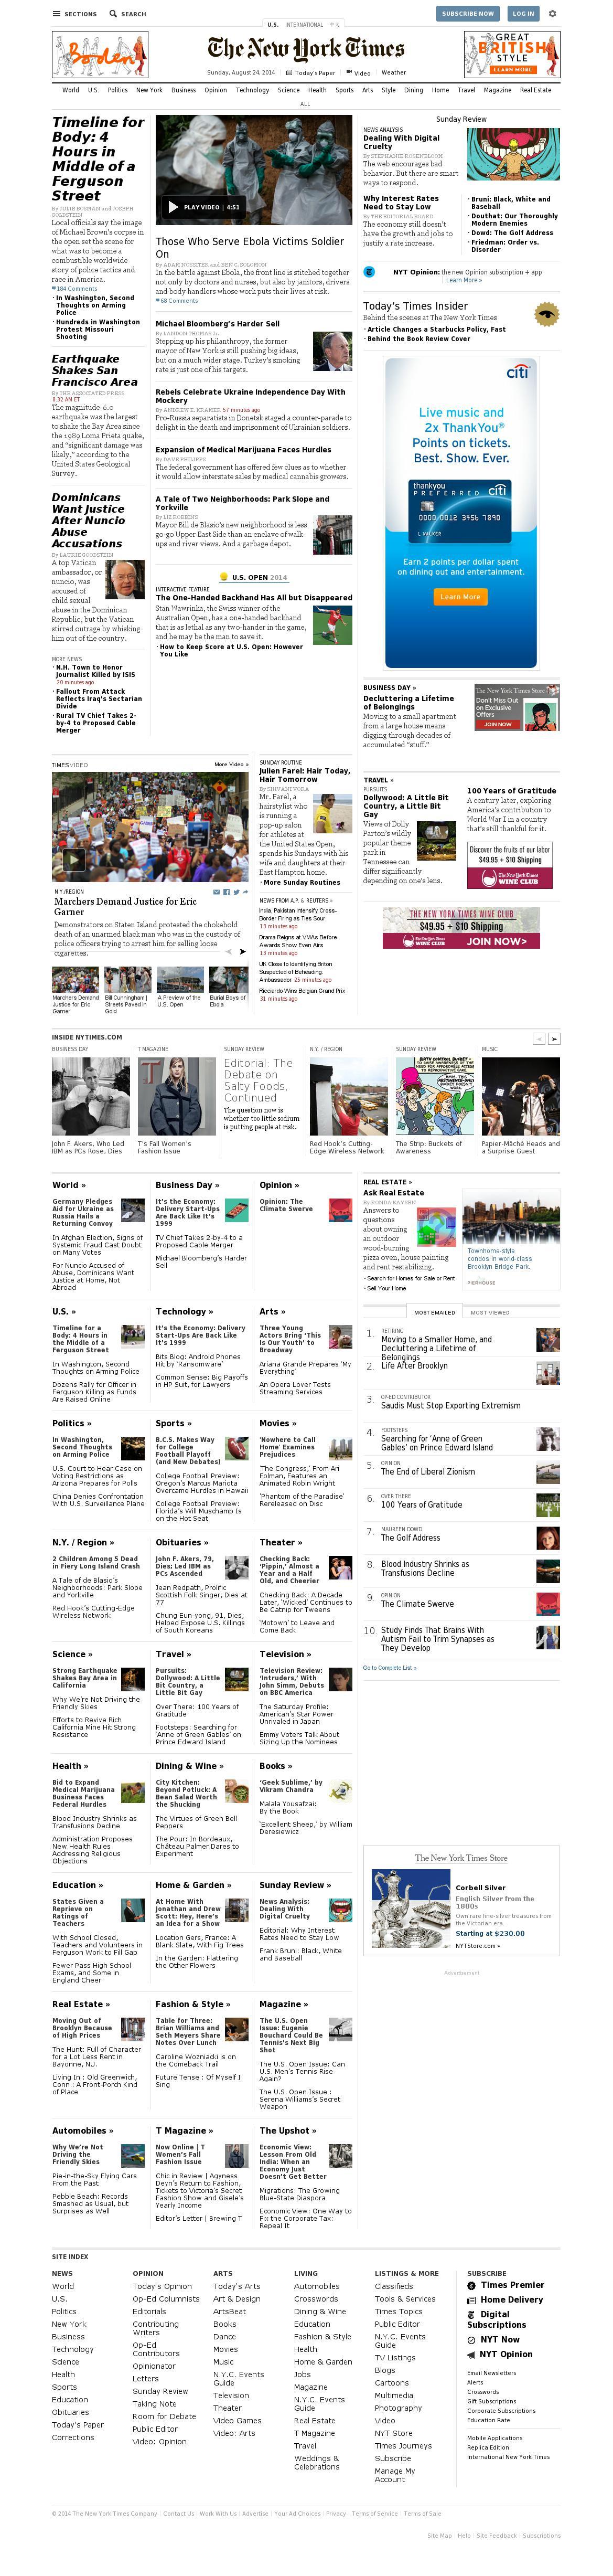 The New York Times at Sunday Aug. 24, 2014, 2:16 p.m. UTC